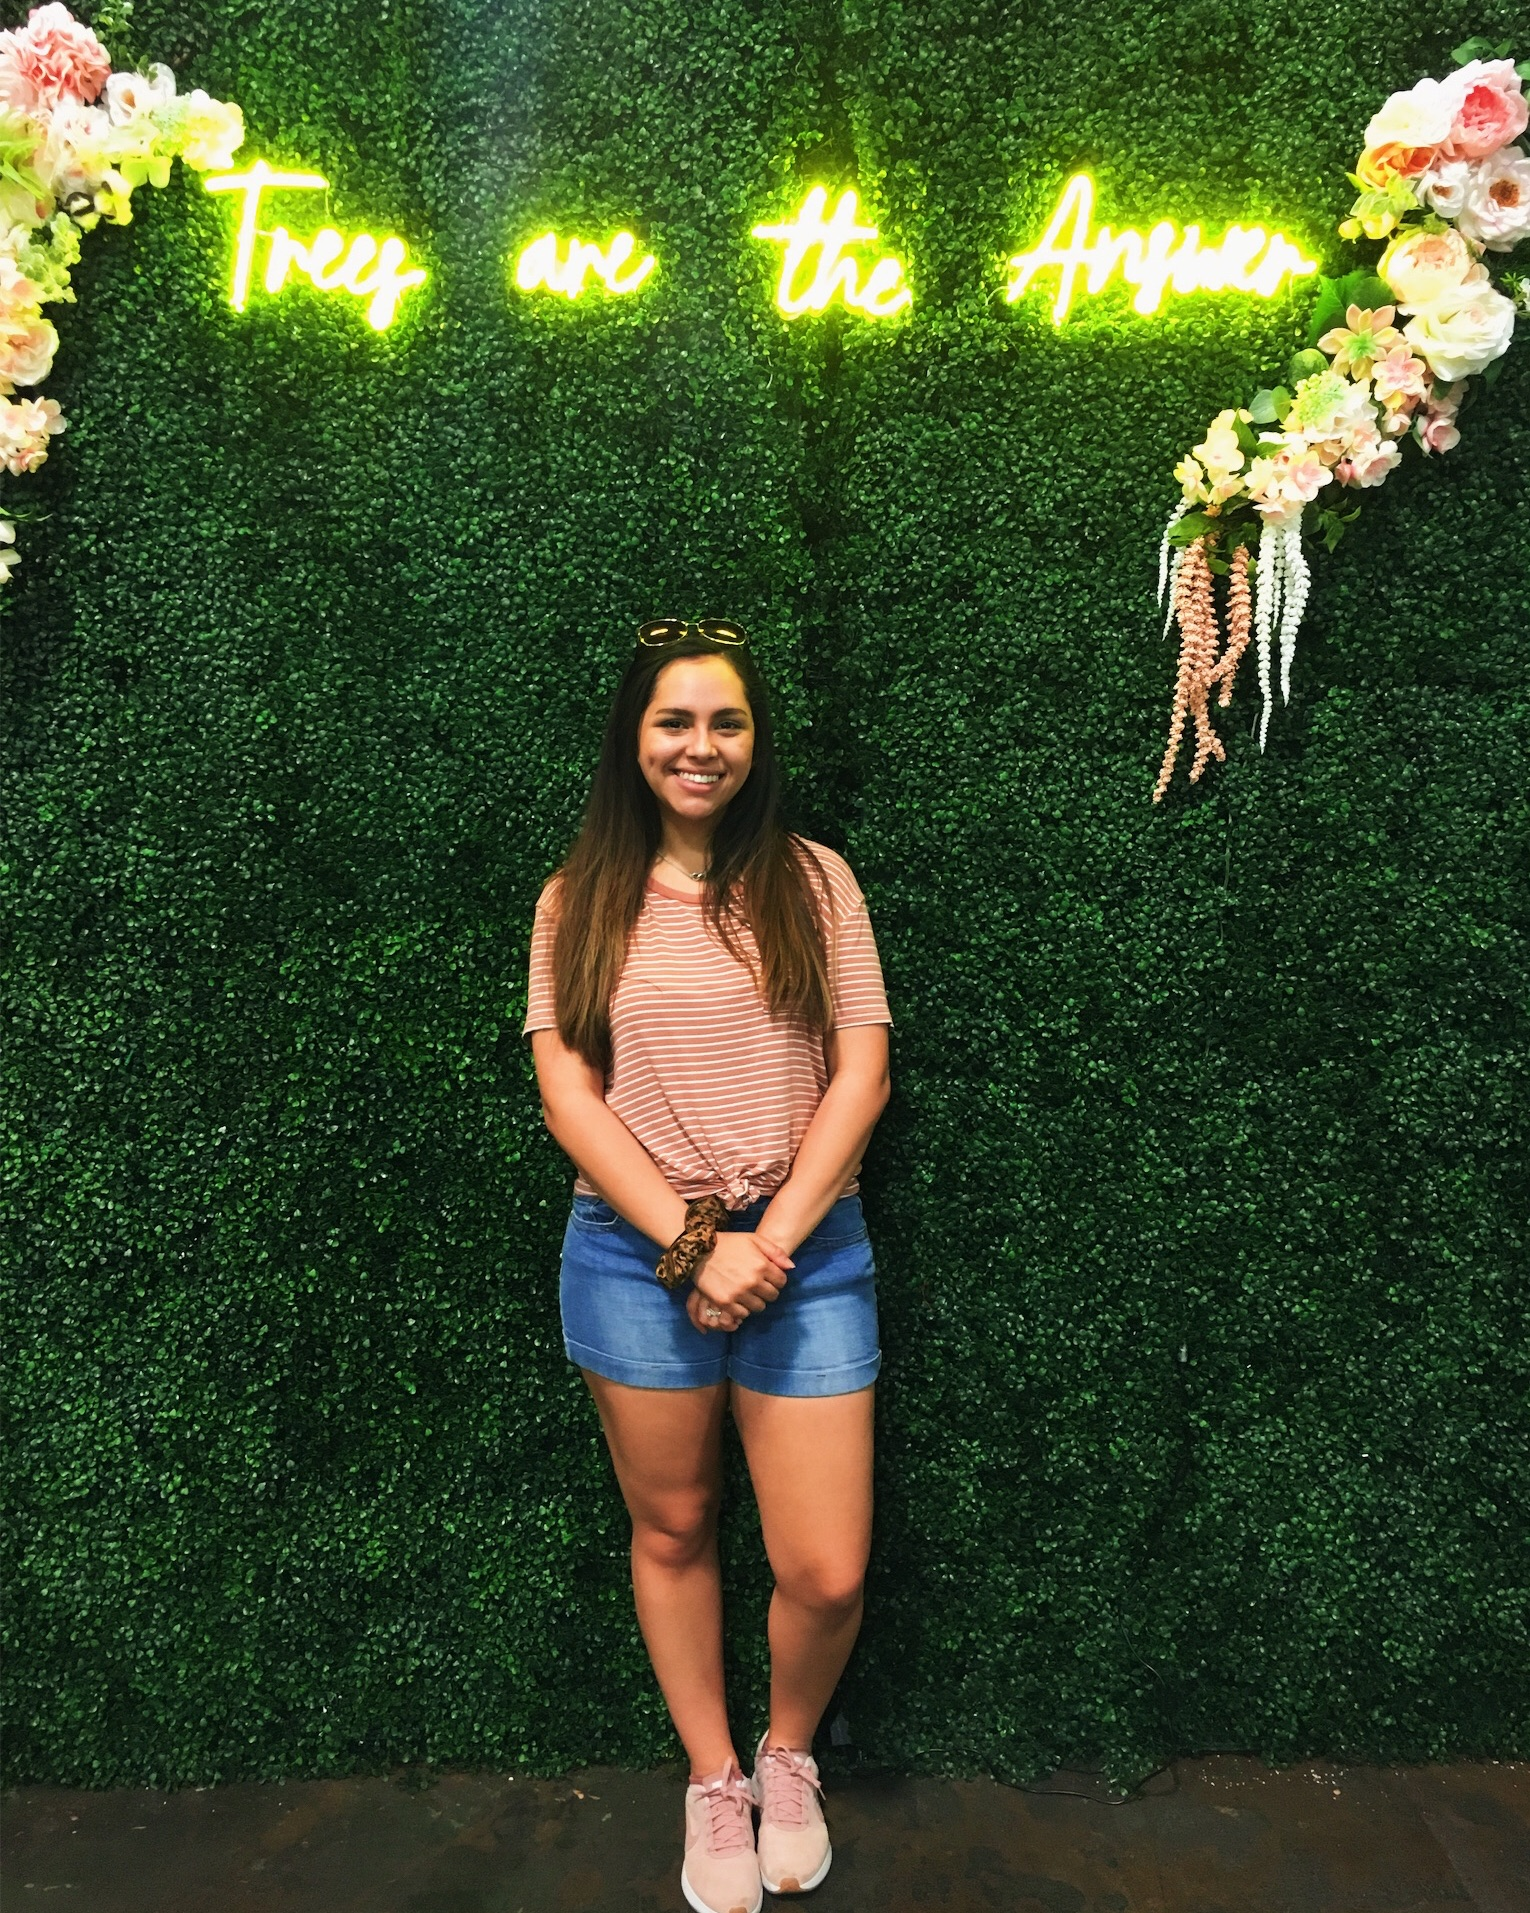 Button Law Firm Marketing Intern, Natalia